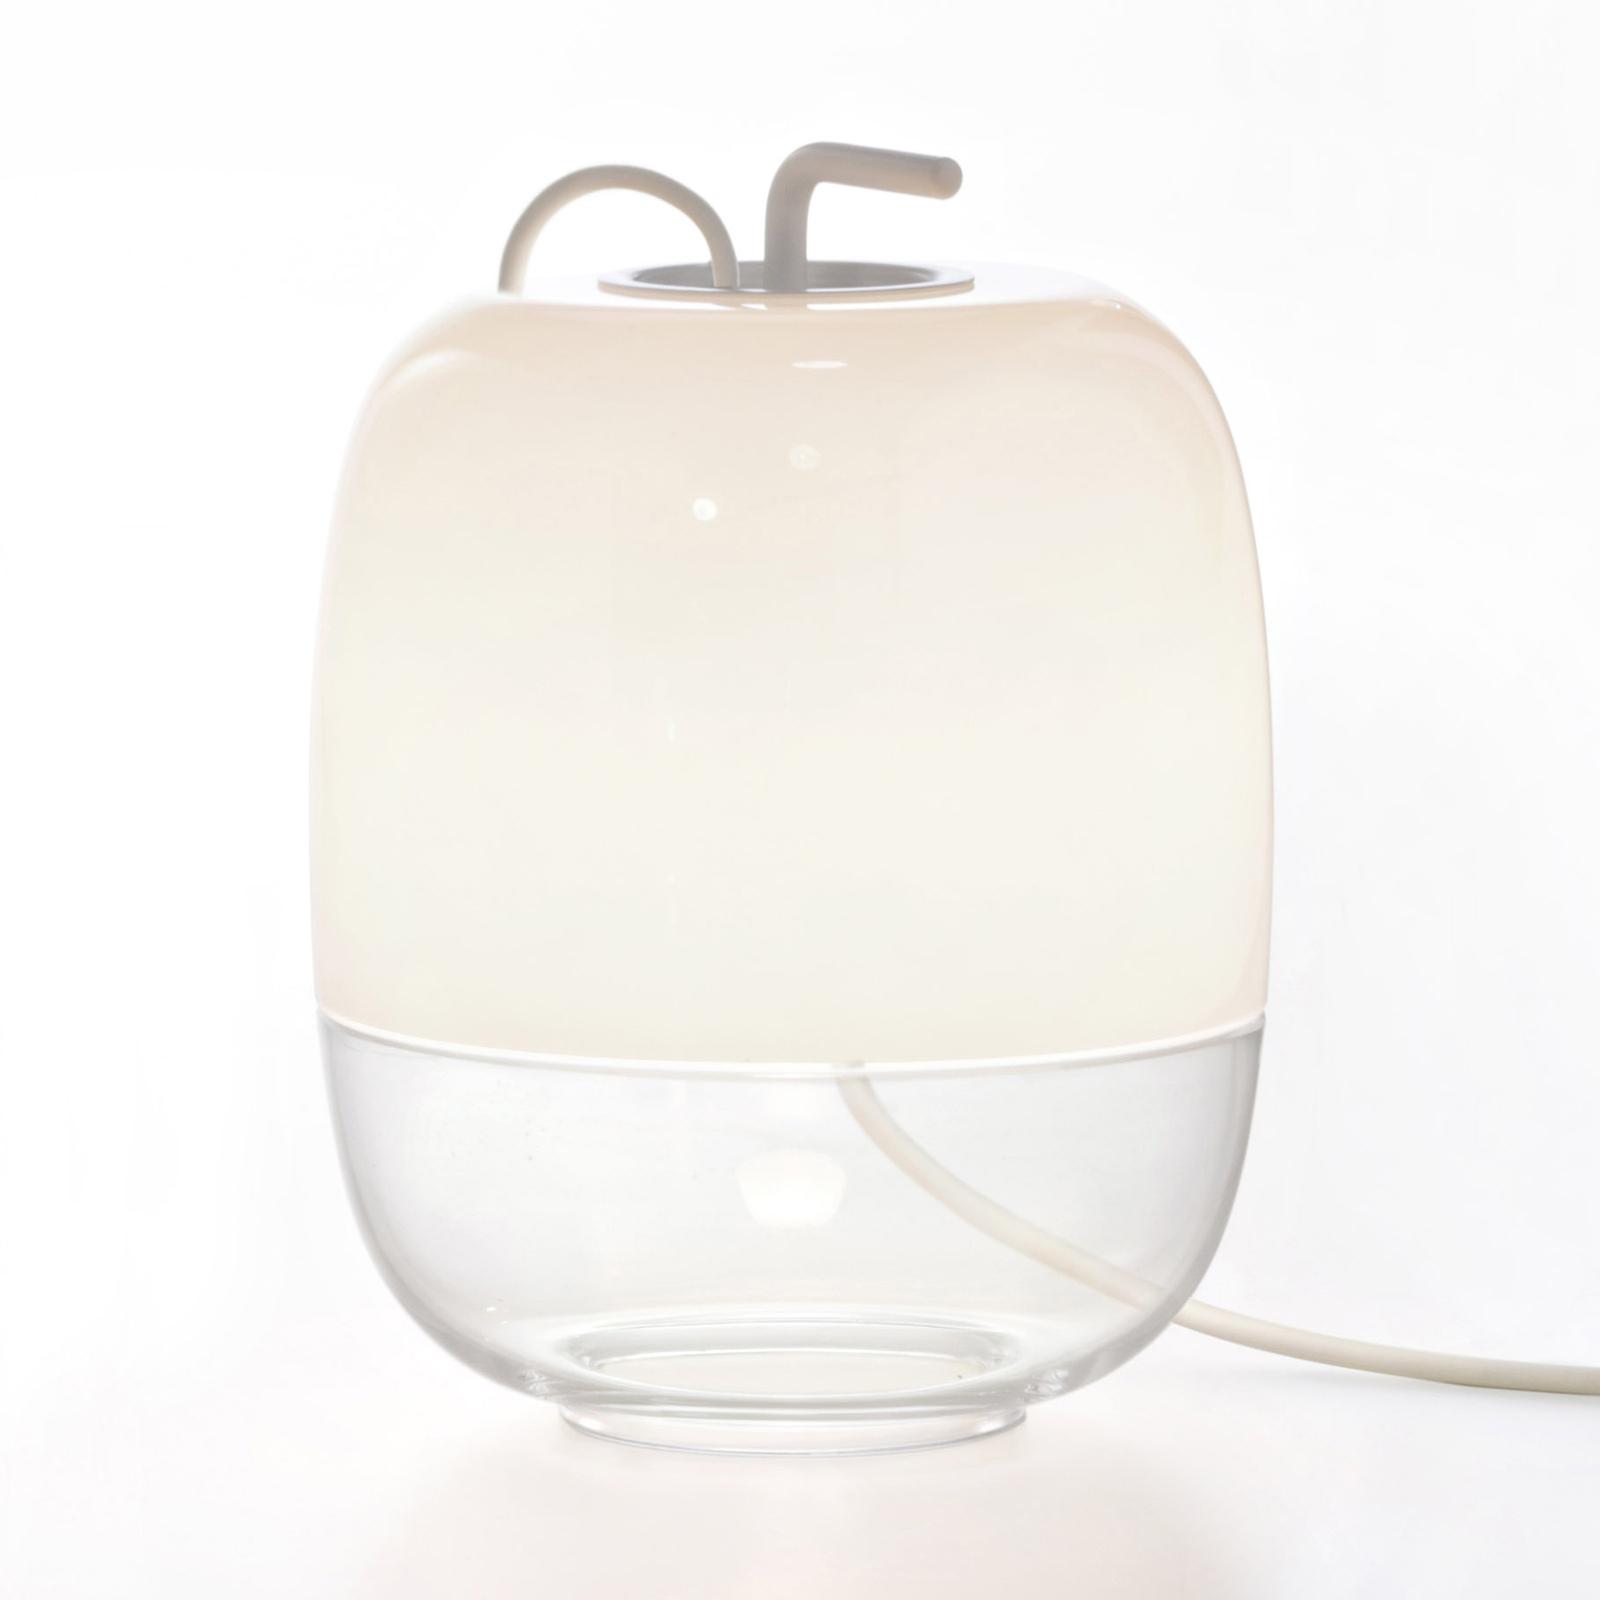 Prandina Gong T1 lampe à poser blanche